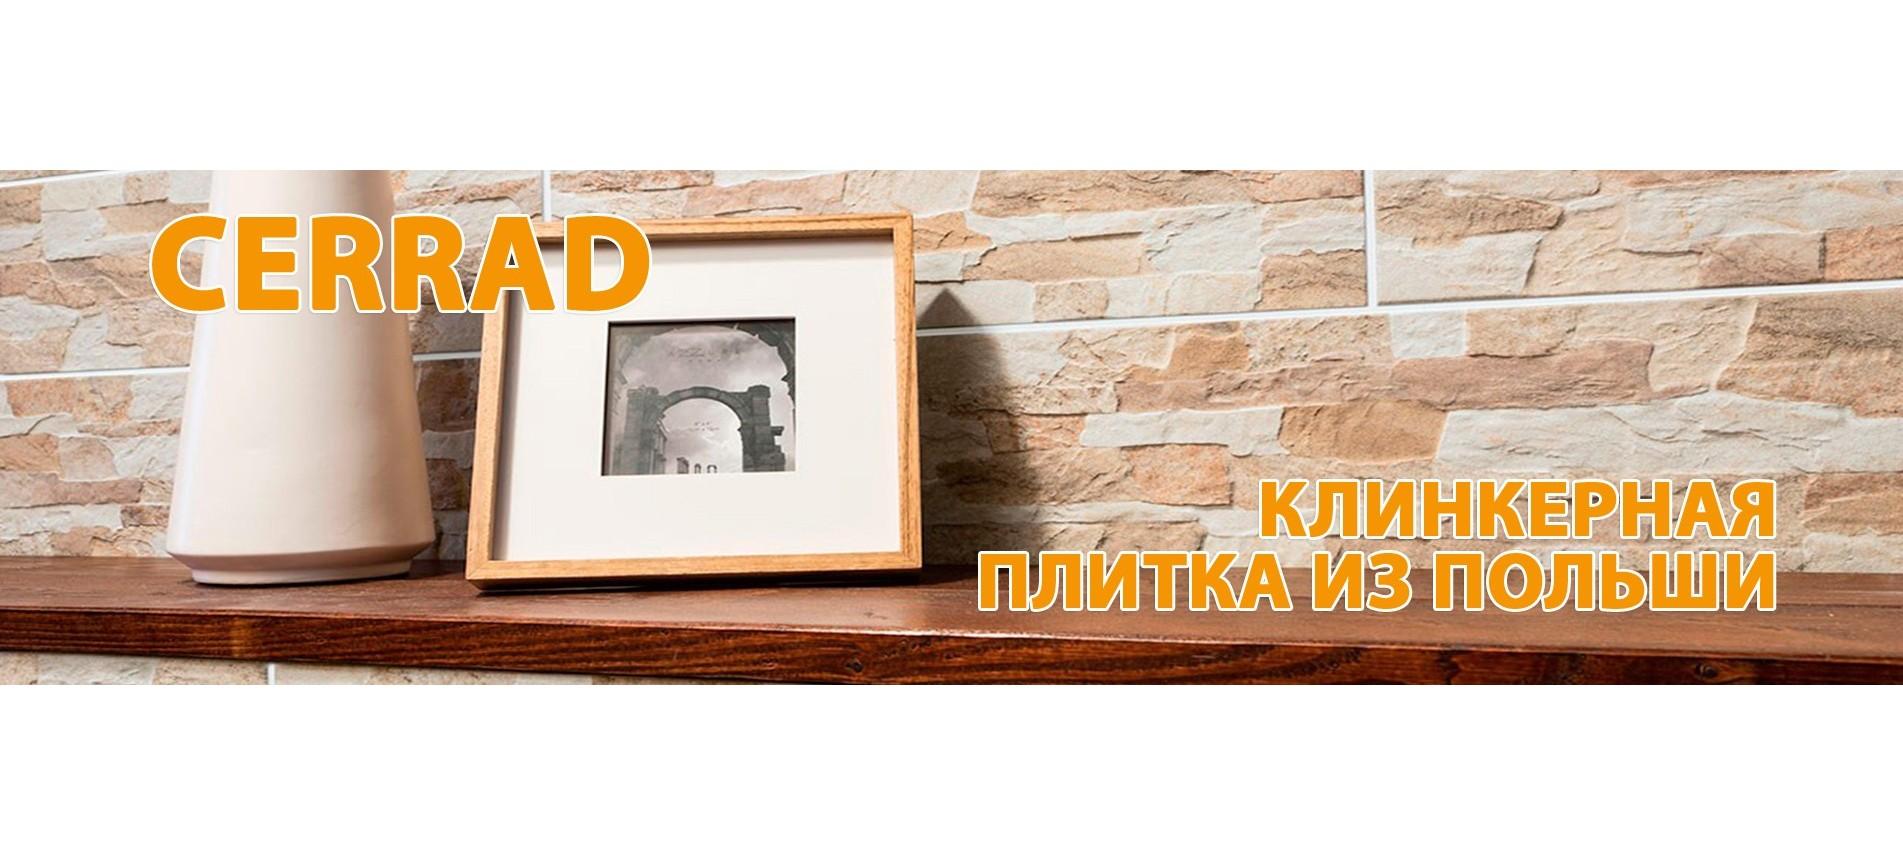 Cerrad - Клинкерная плитка Aragon